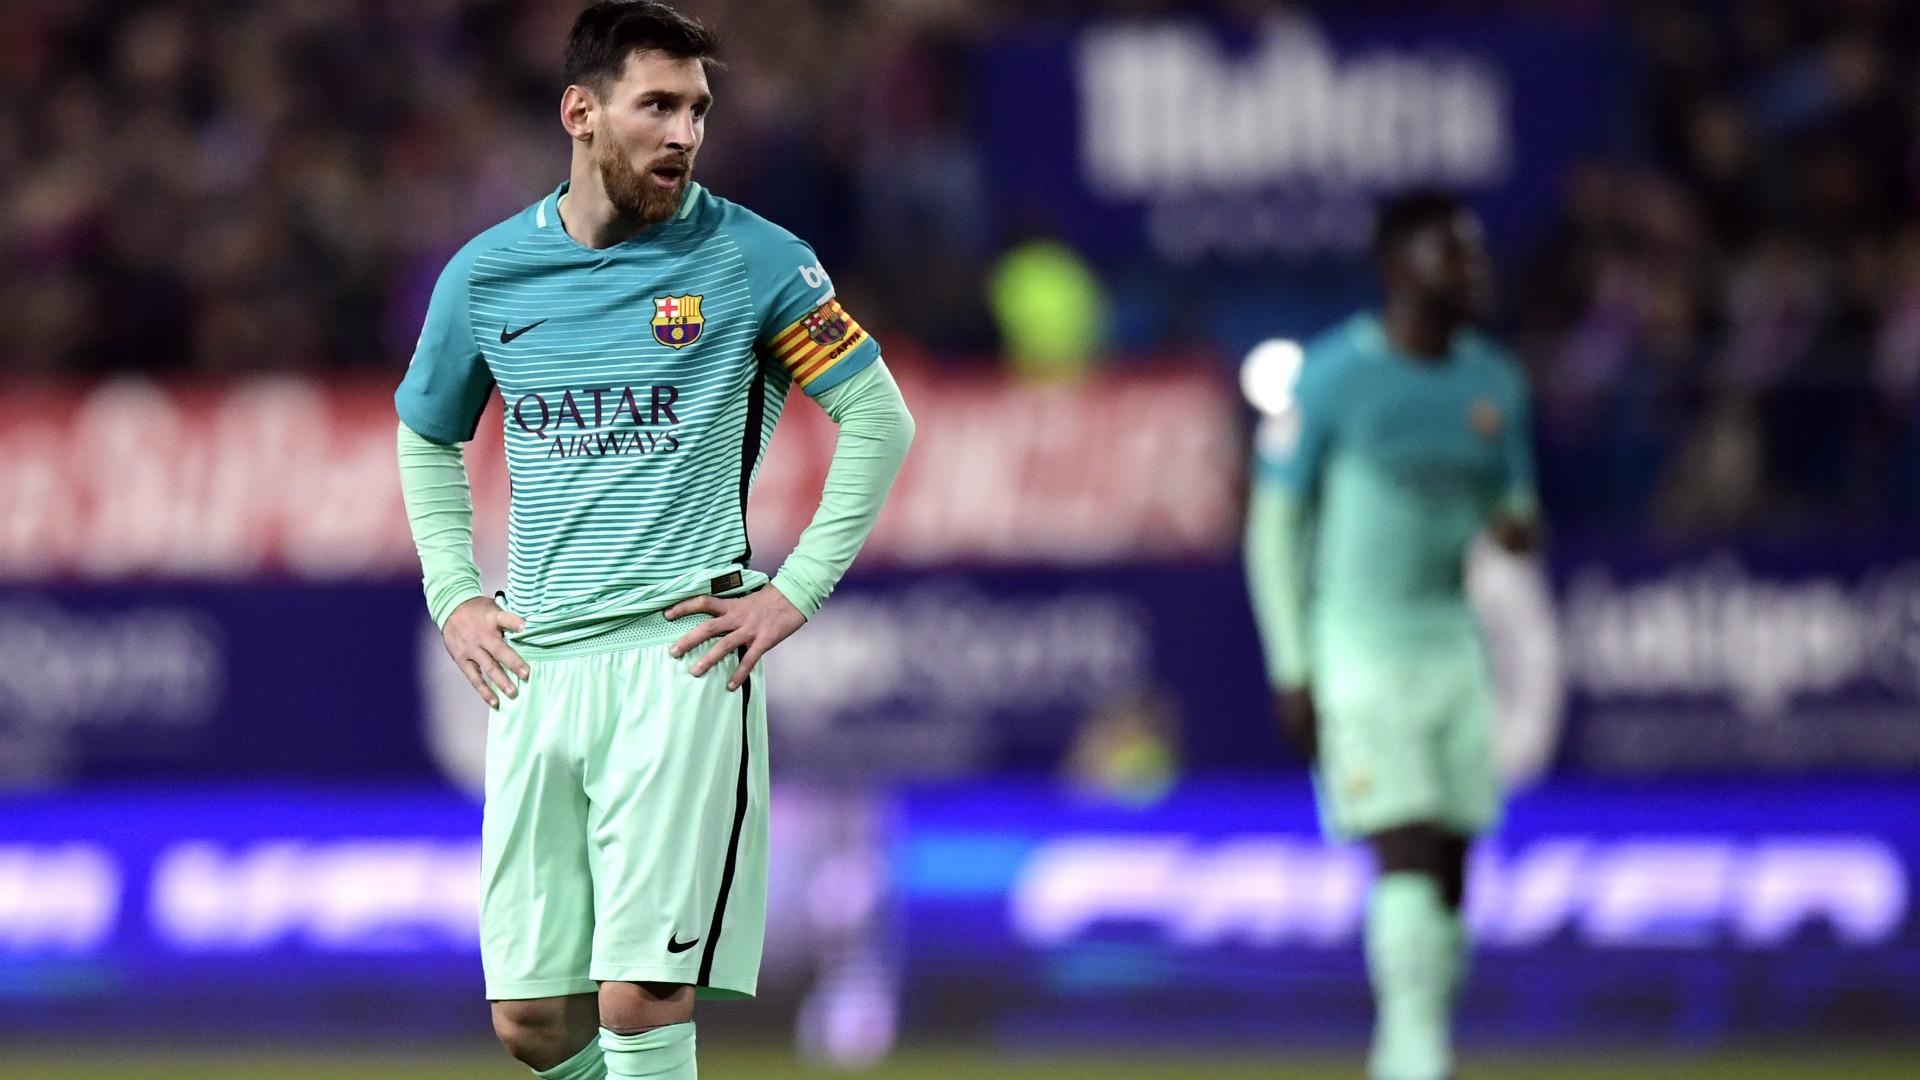 ... Lionel Messi Atletico Madrid Barcelona Copa del Rey